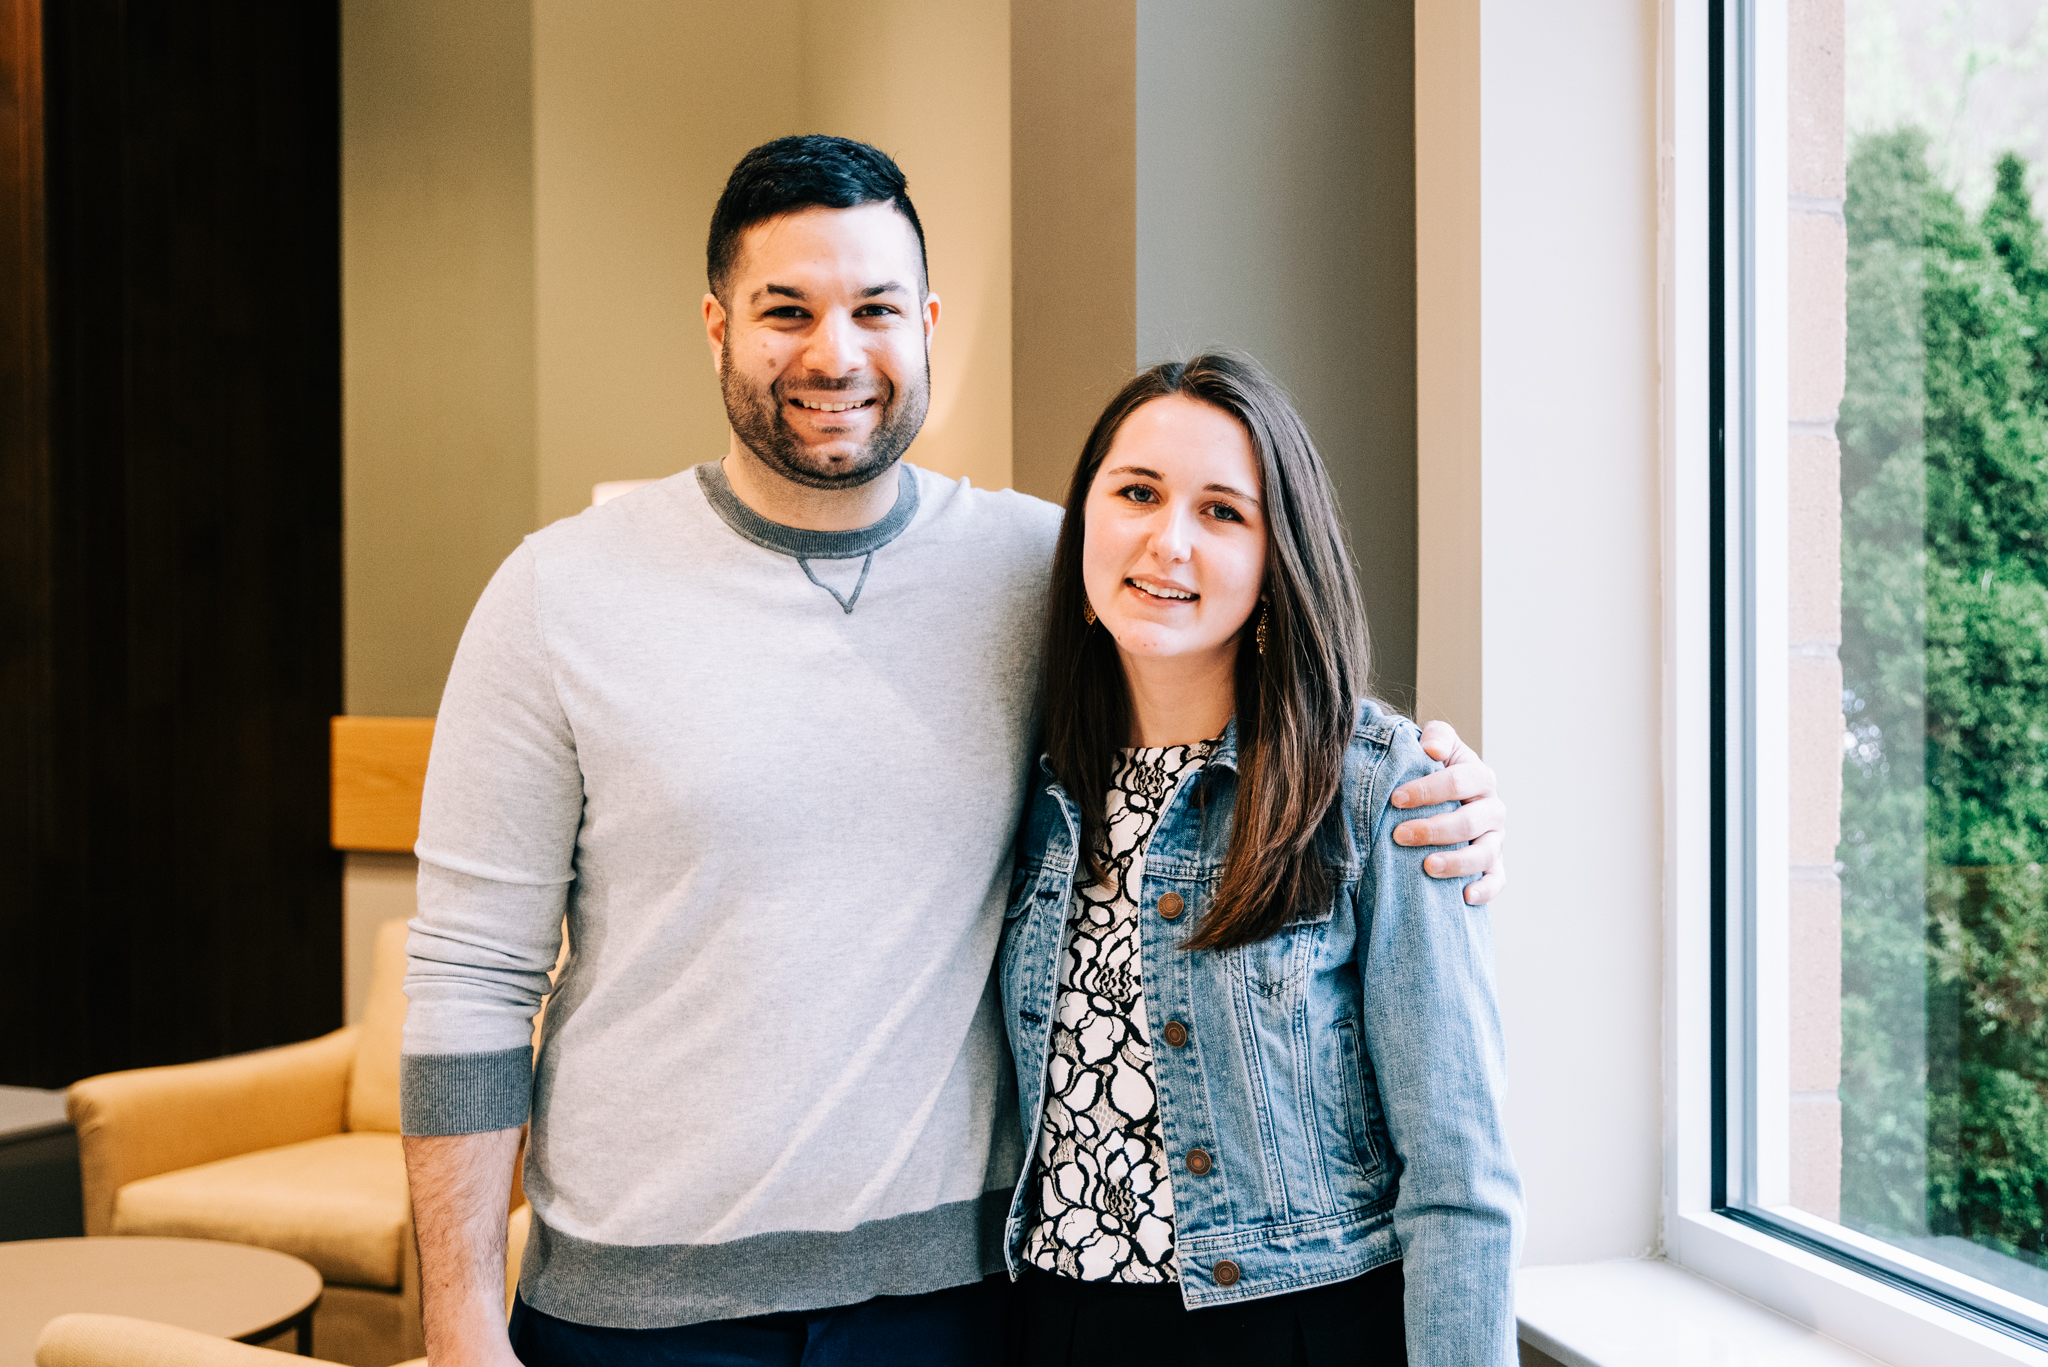 Kevin Kosmal and his fianceé, Ali Stashak.